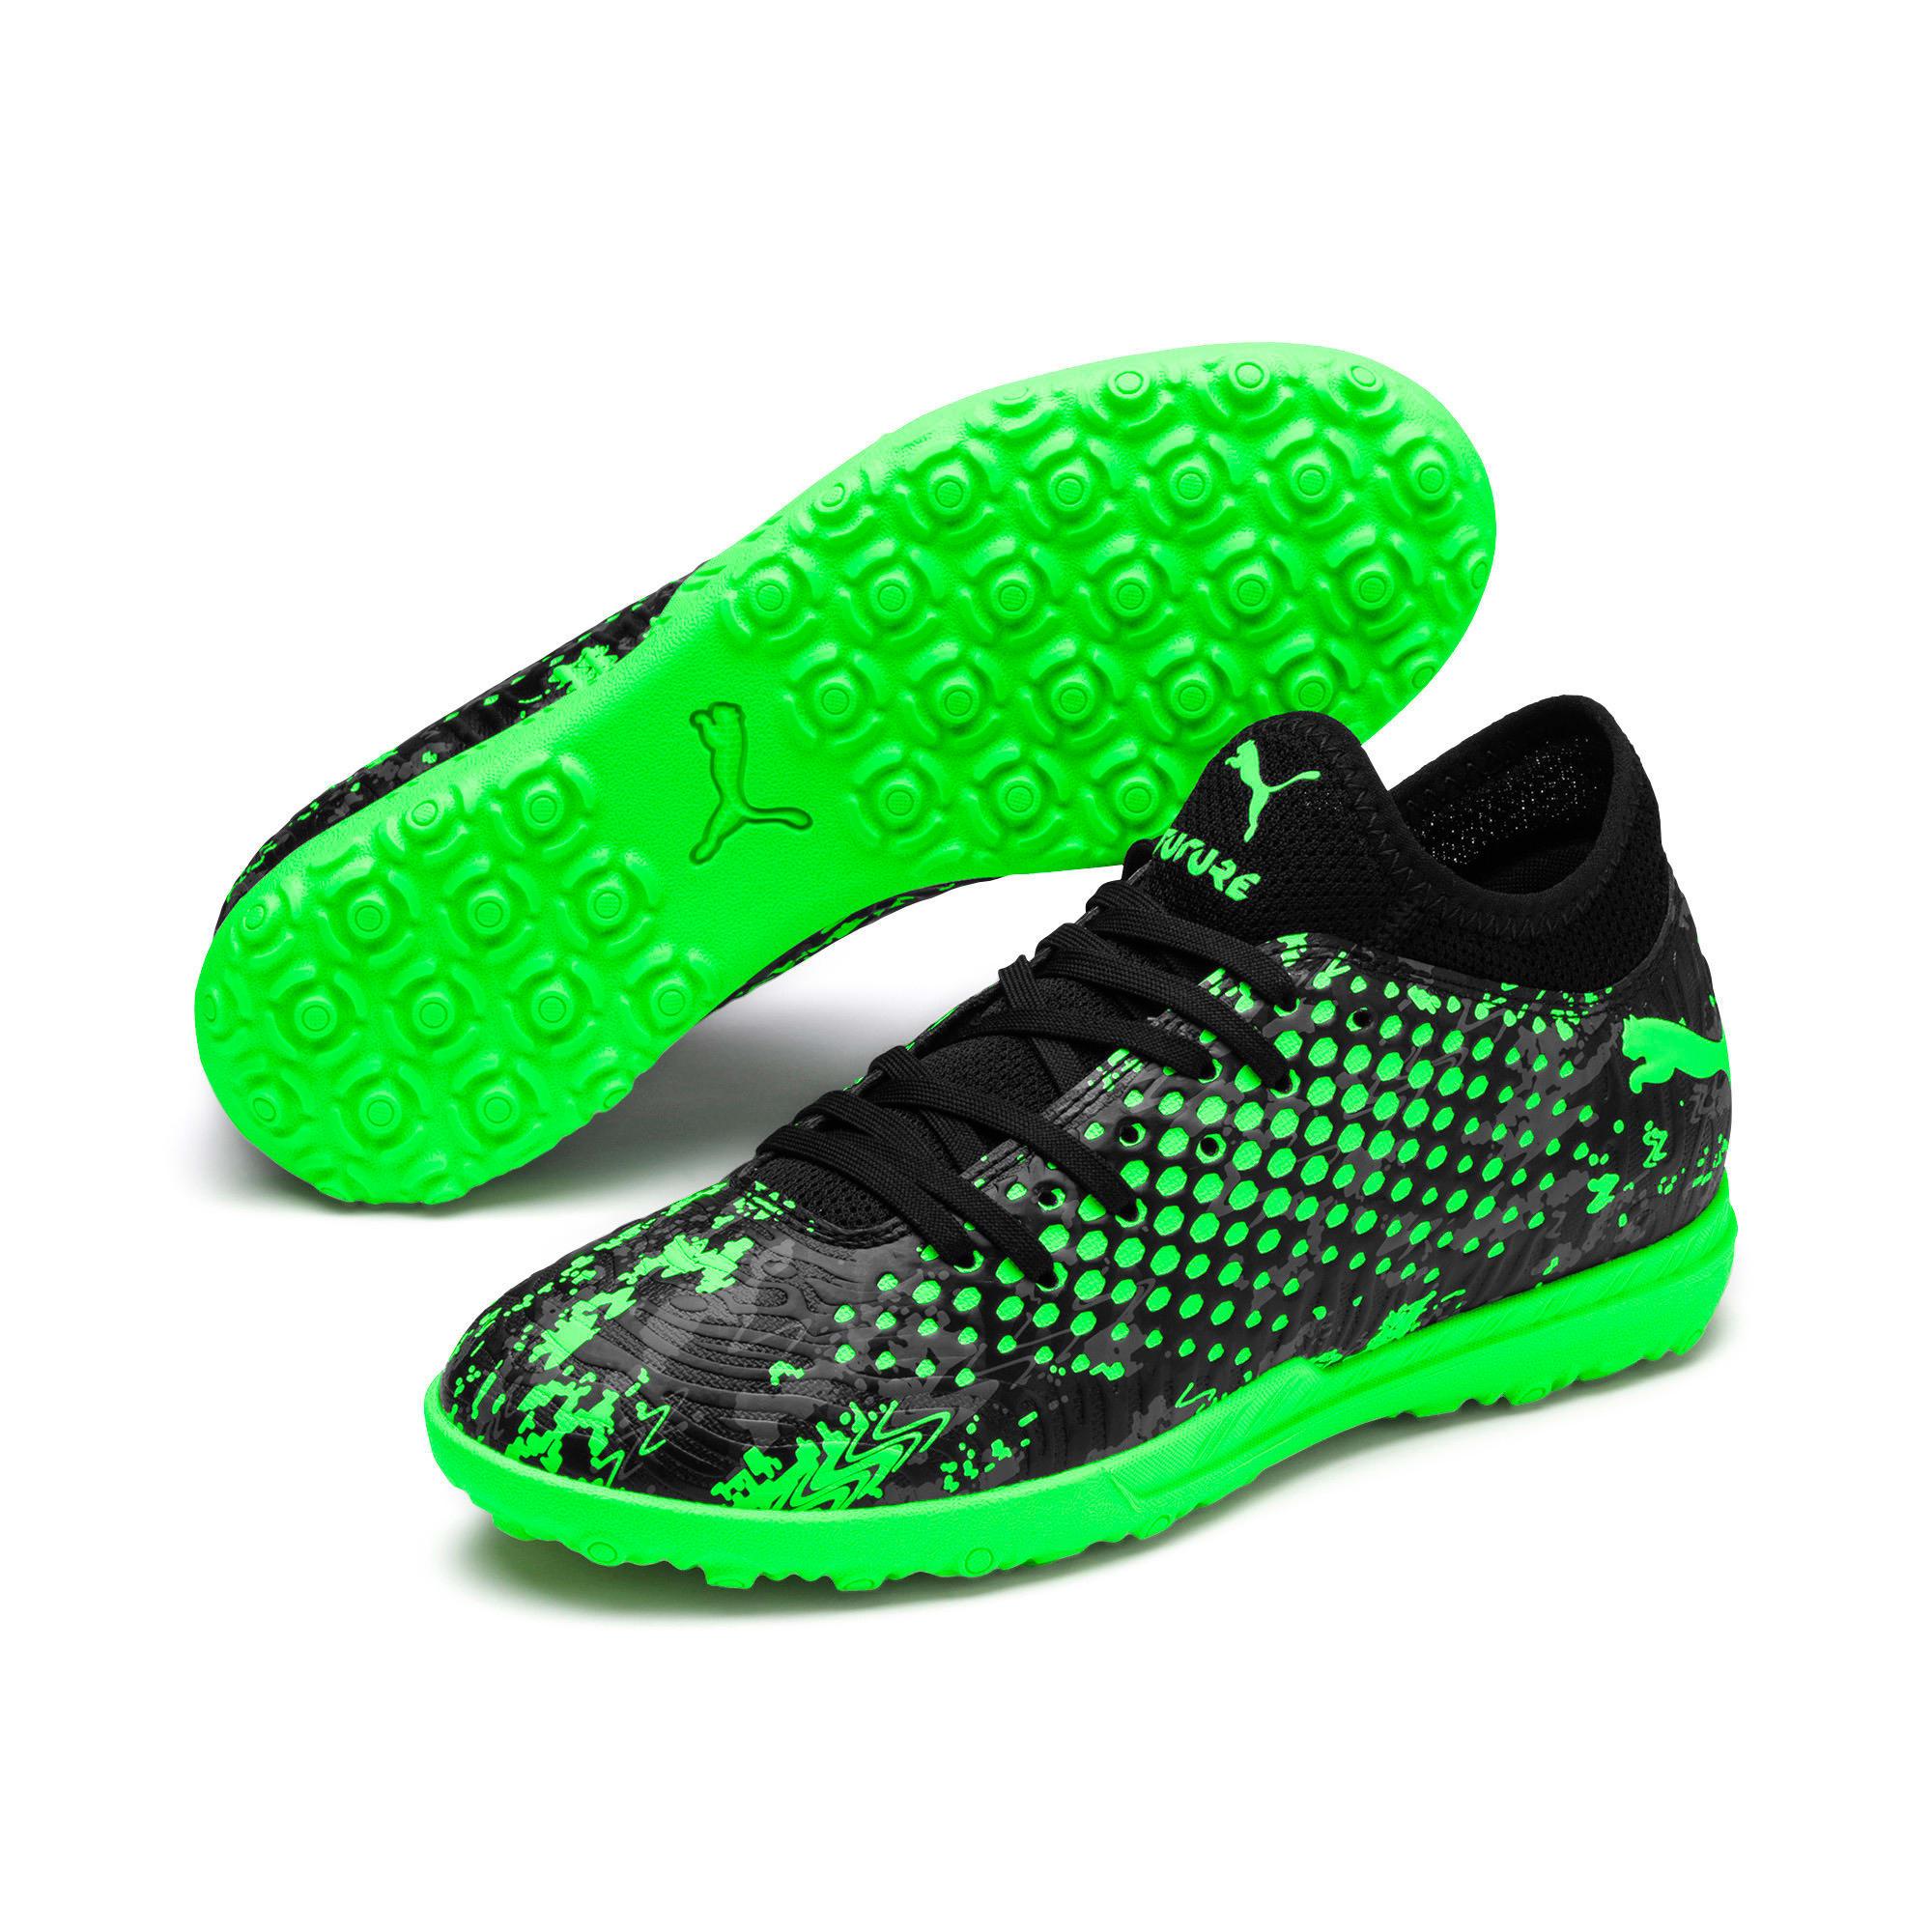 Thumbnail 2 of FUTURE 19.4 TT Youth Football Boots, Black-Gray-Green Gecko, medium